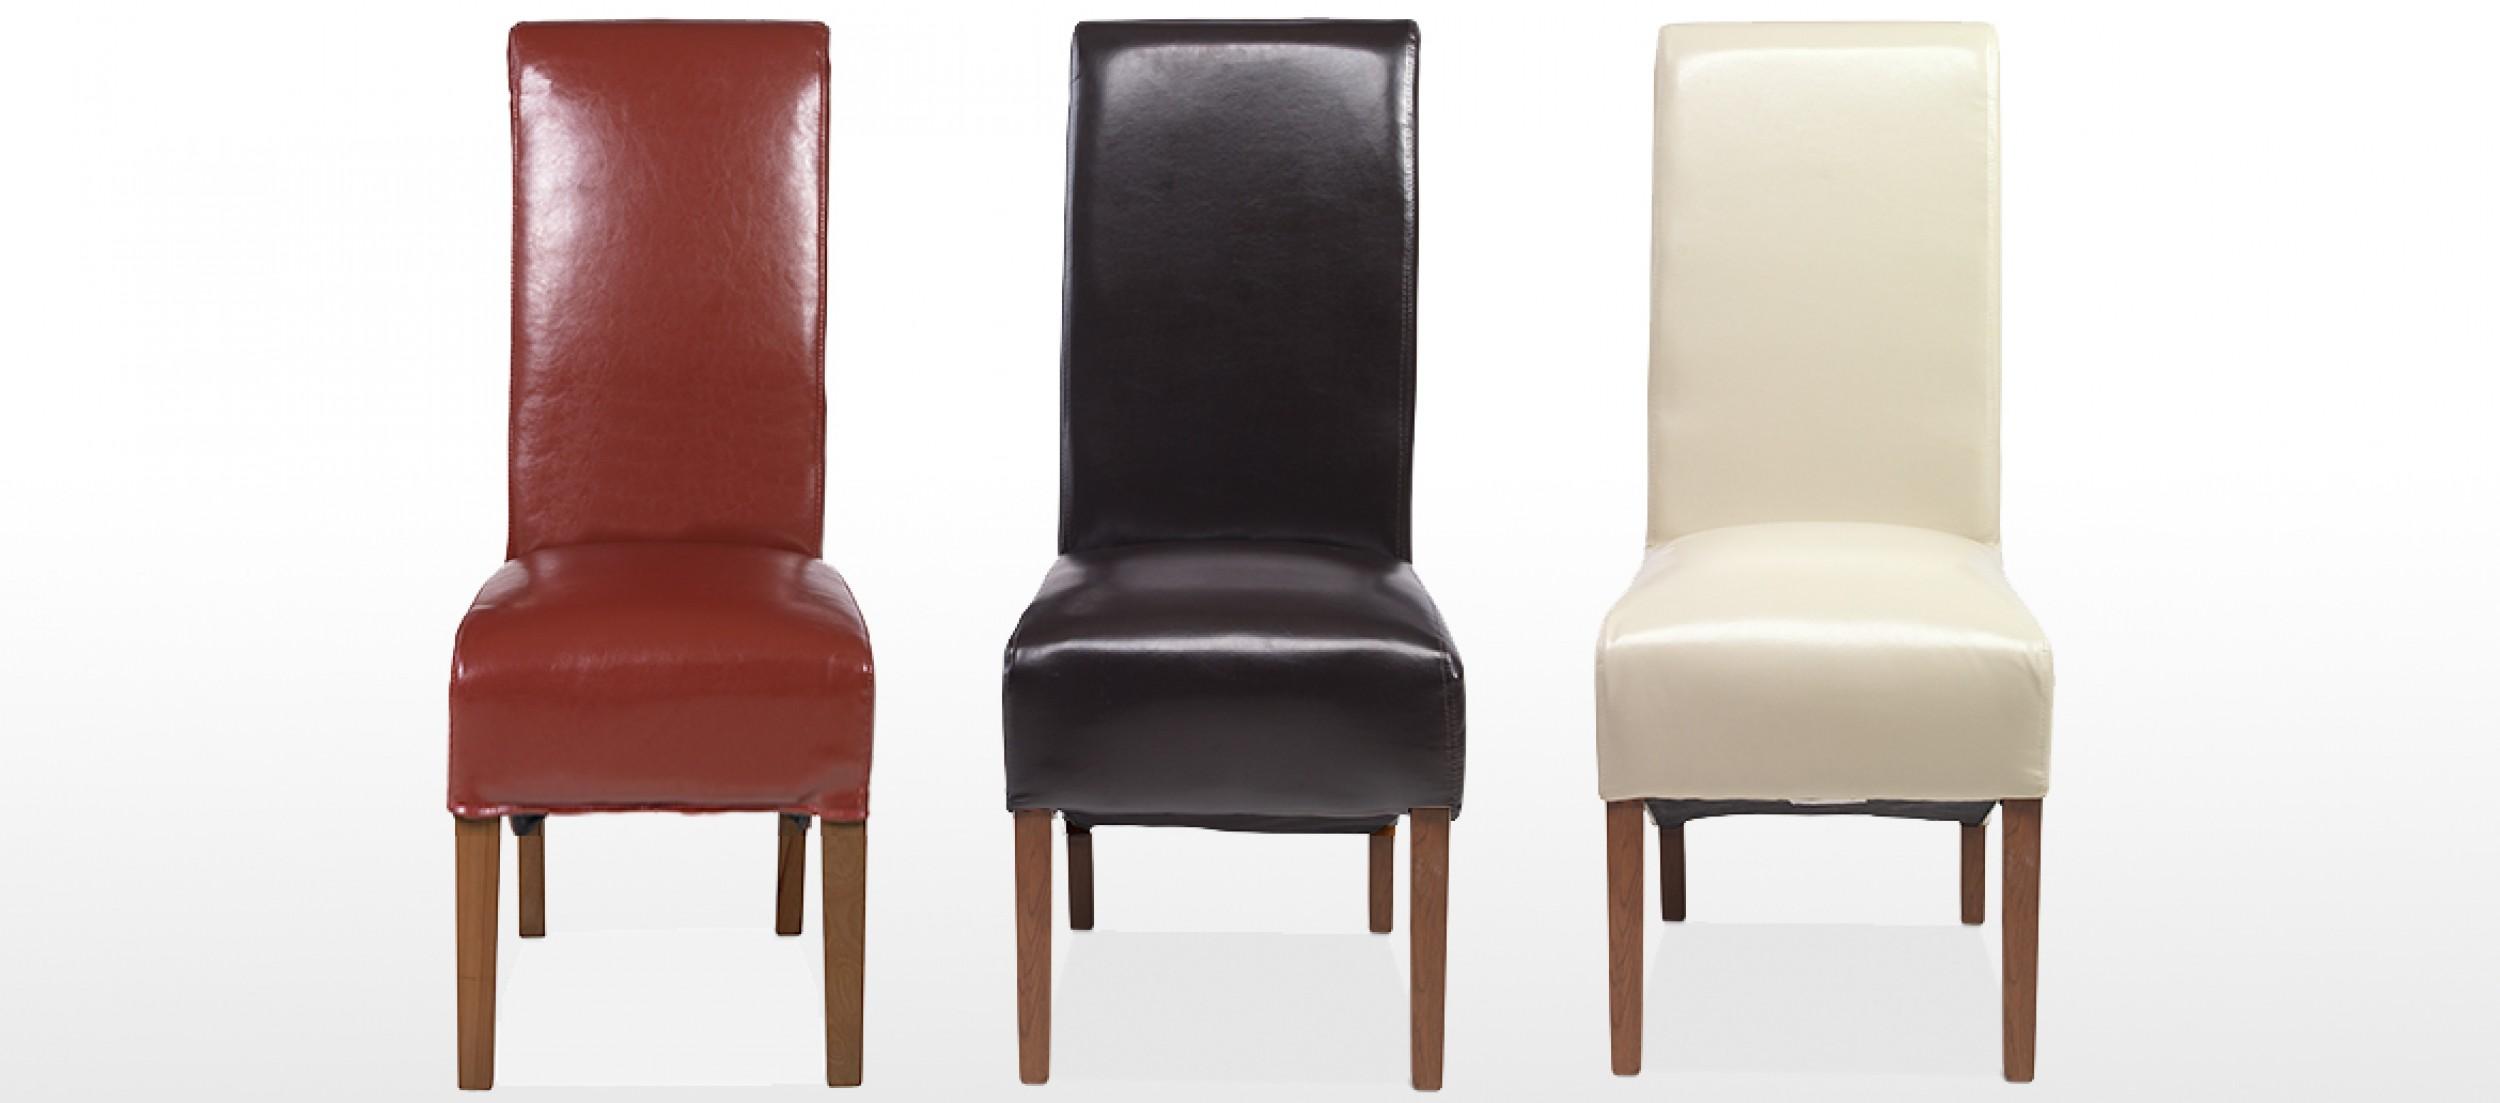 Jali Sheesham 180 cm Thakat Dining Table and 8 Chairs  : jali thakat dining table set leather chairs4 from www.quercusliving.co.uk size 2500 x 1103 jpeg 175kB